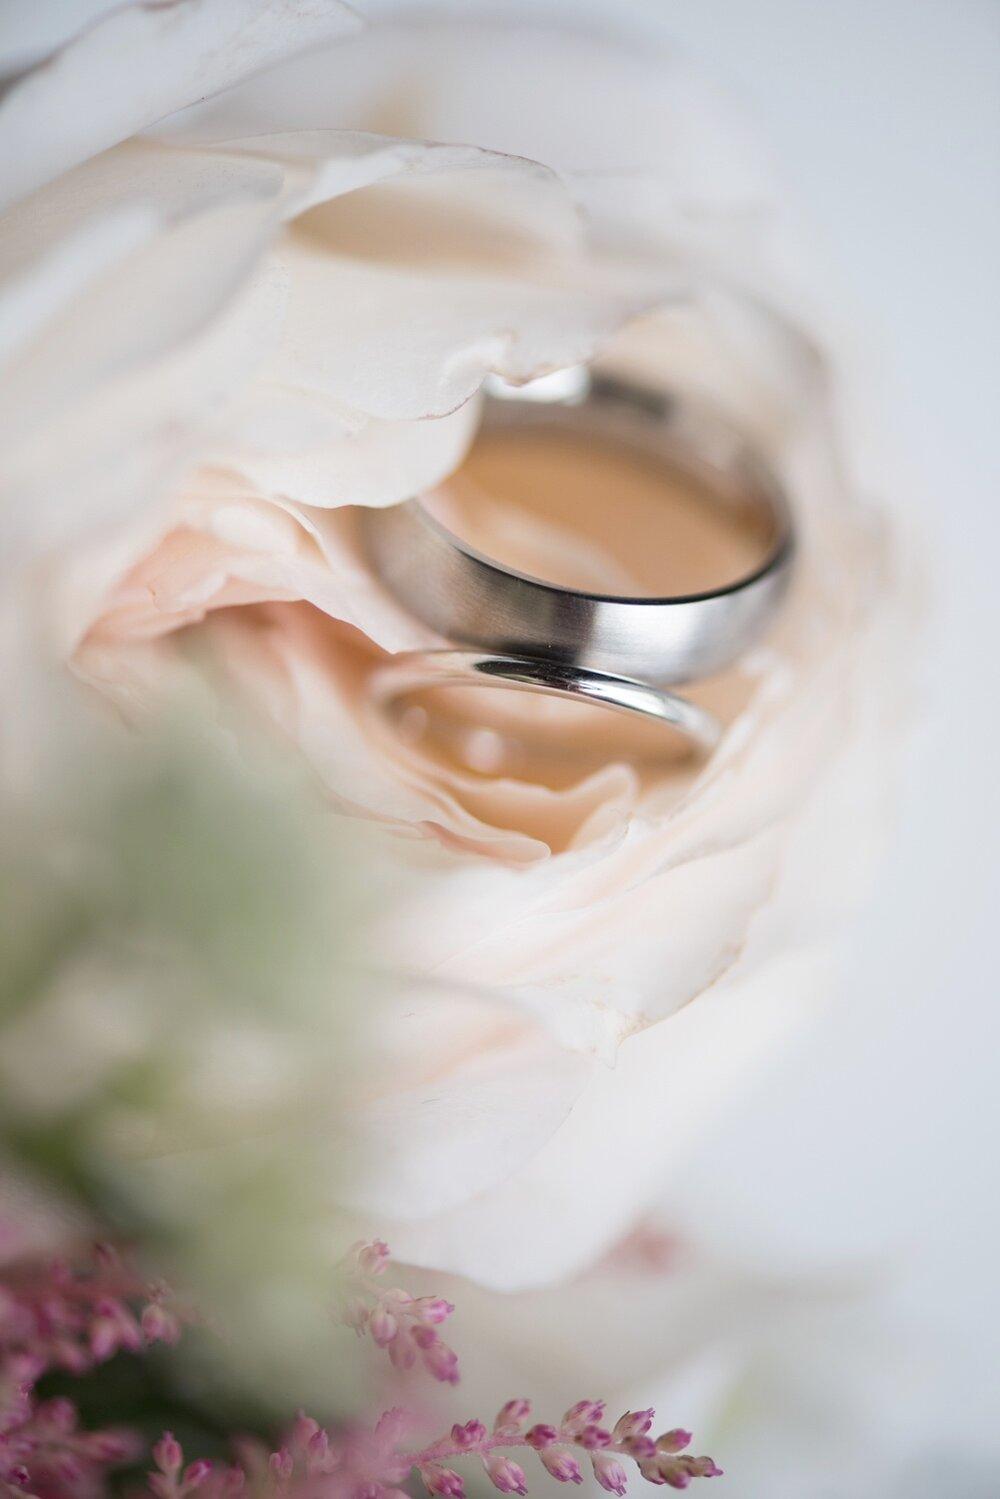 len_lynne_wedding_rings_edgartown-1633.jpg